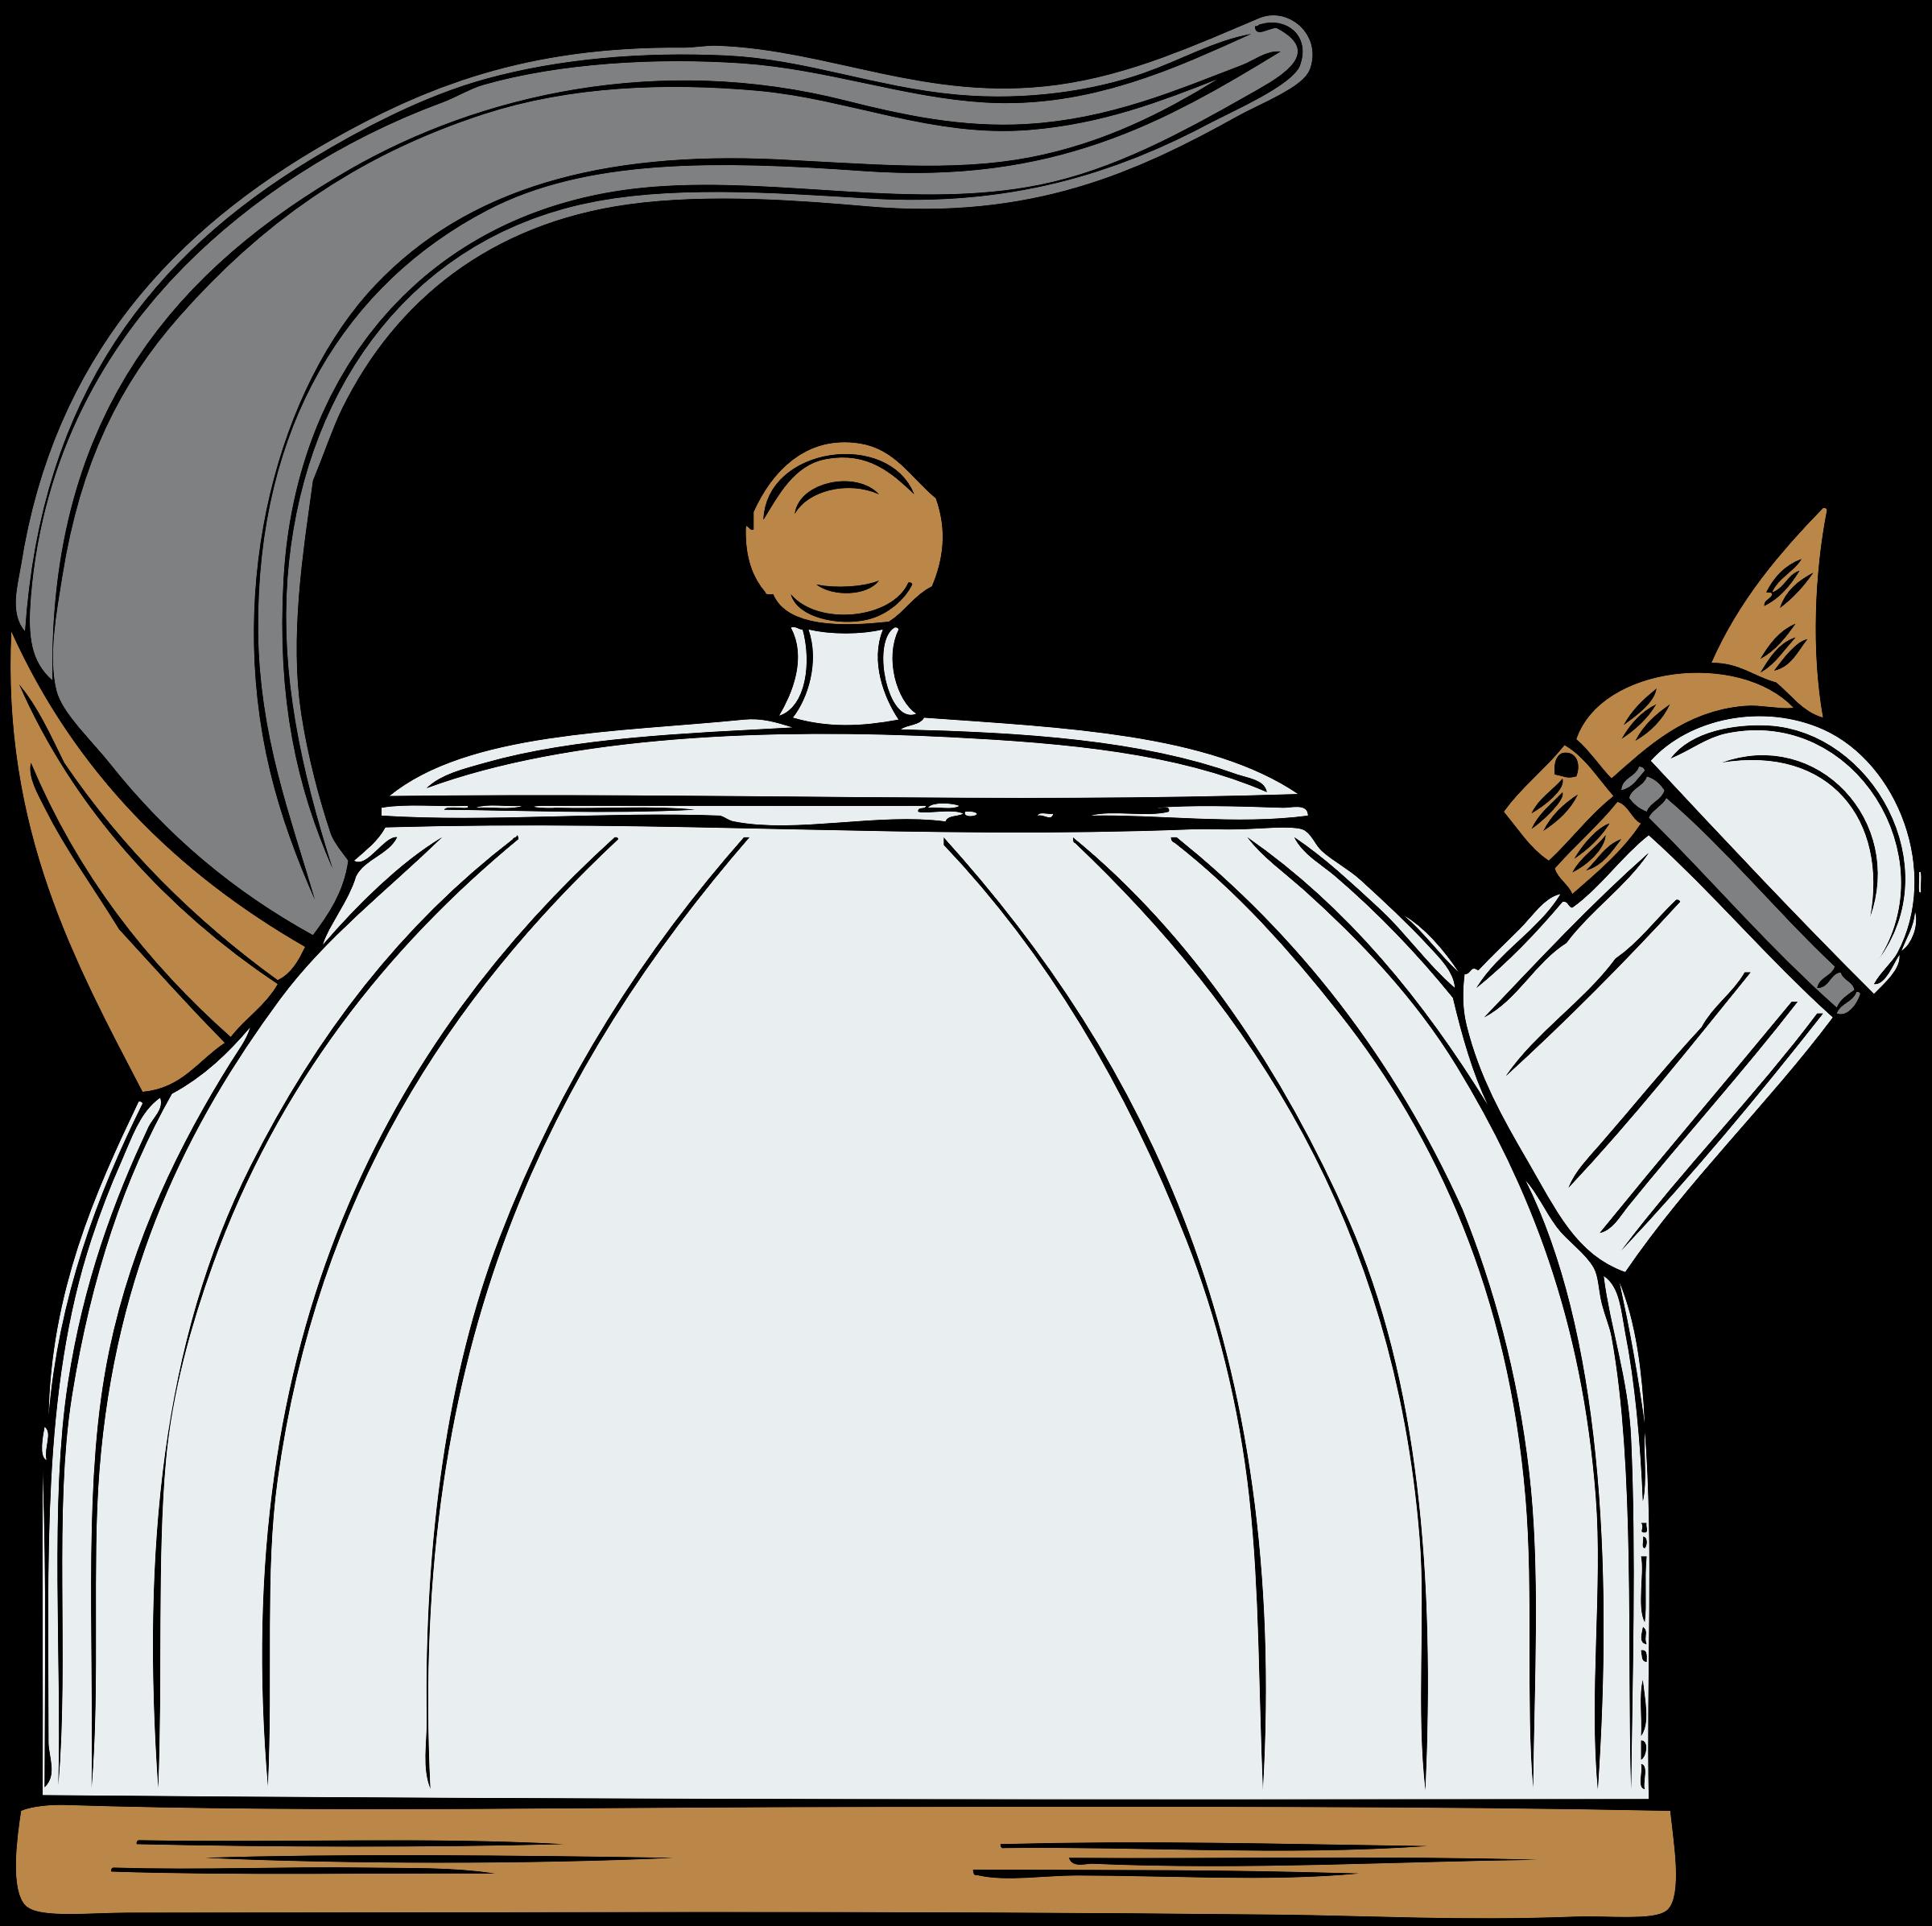 Teapot clipart kitchen utensil Clipart teapot teapot